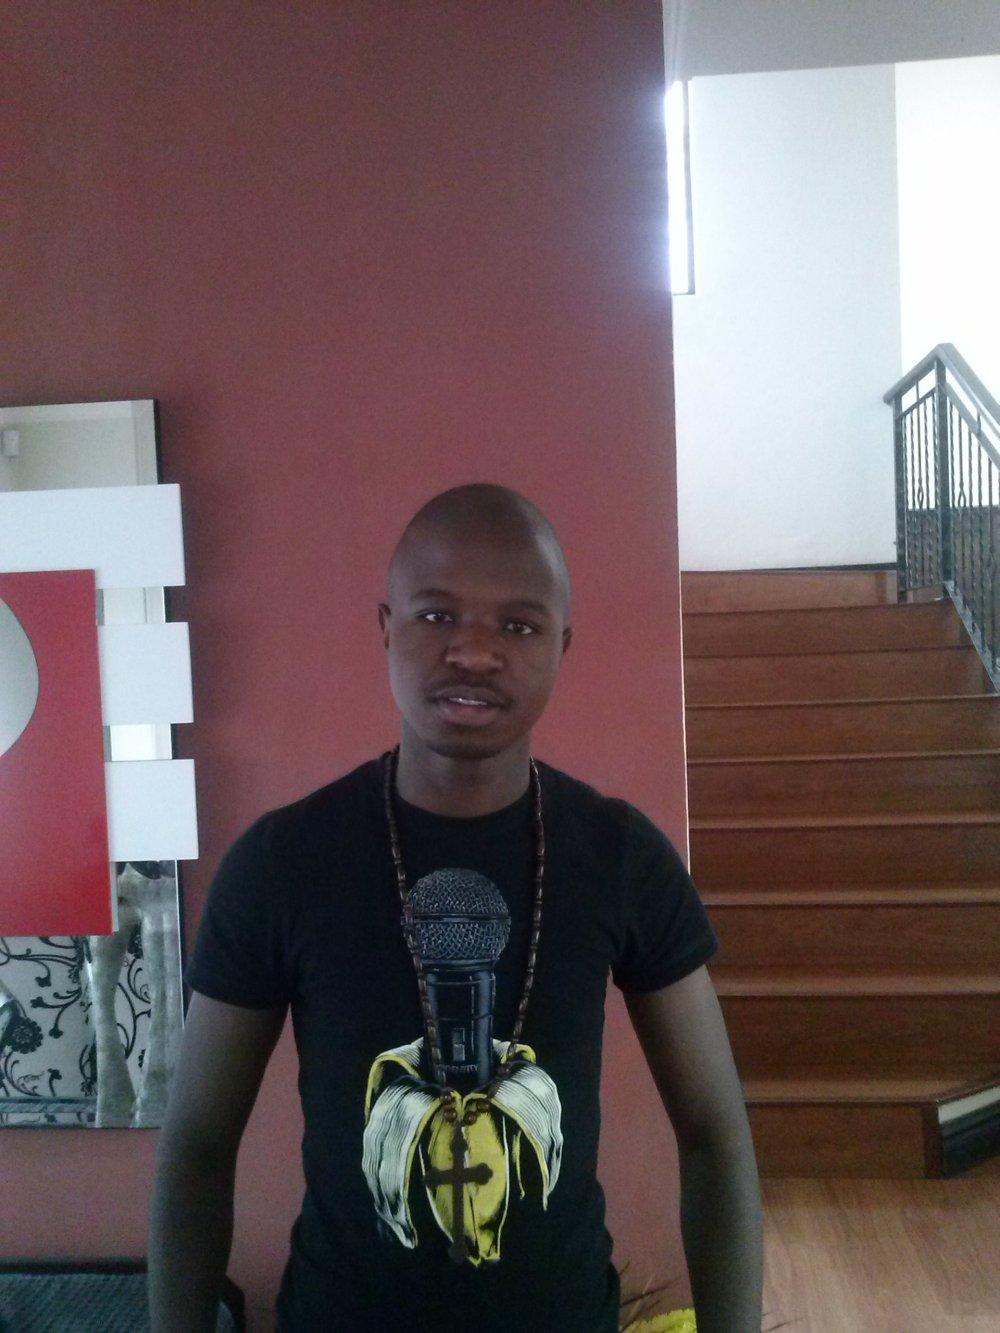 Nkanyiso khumalo